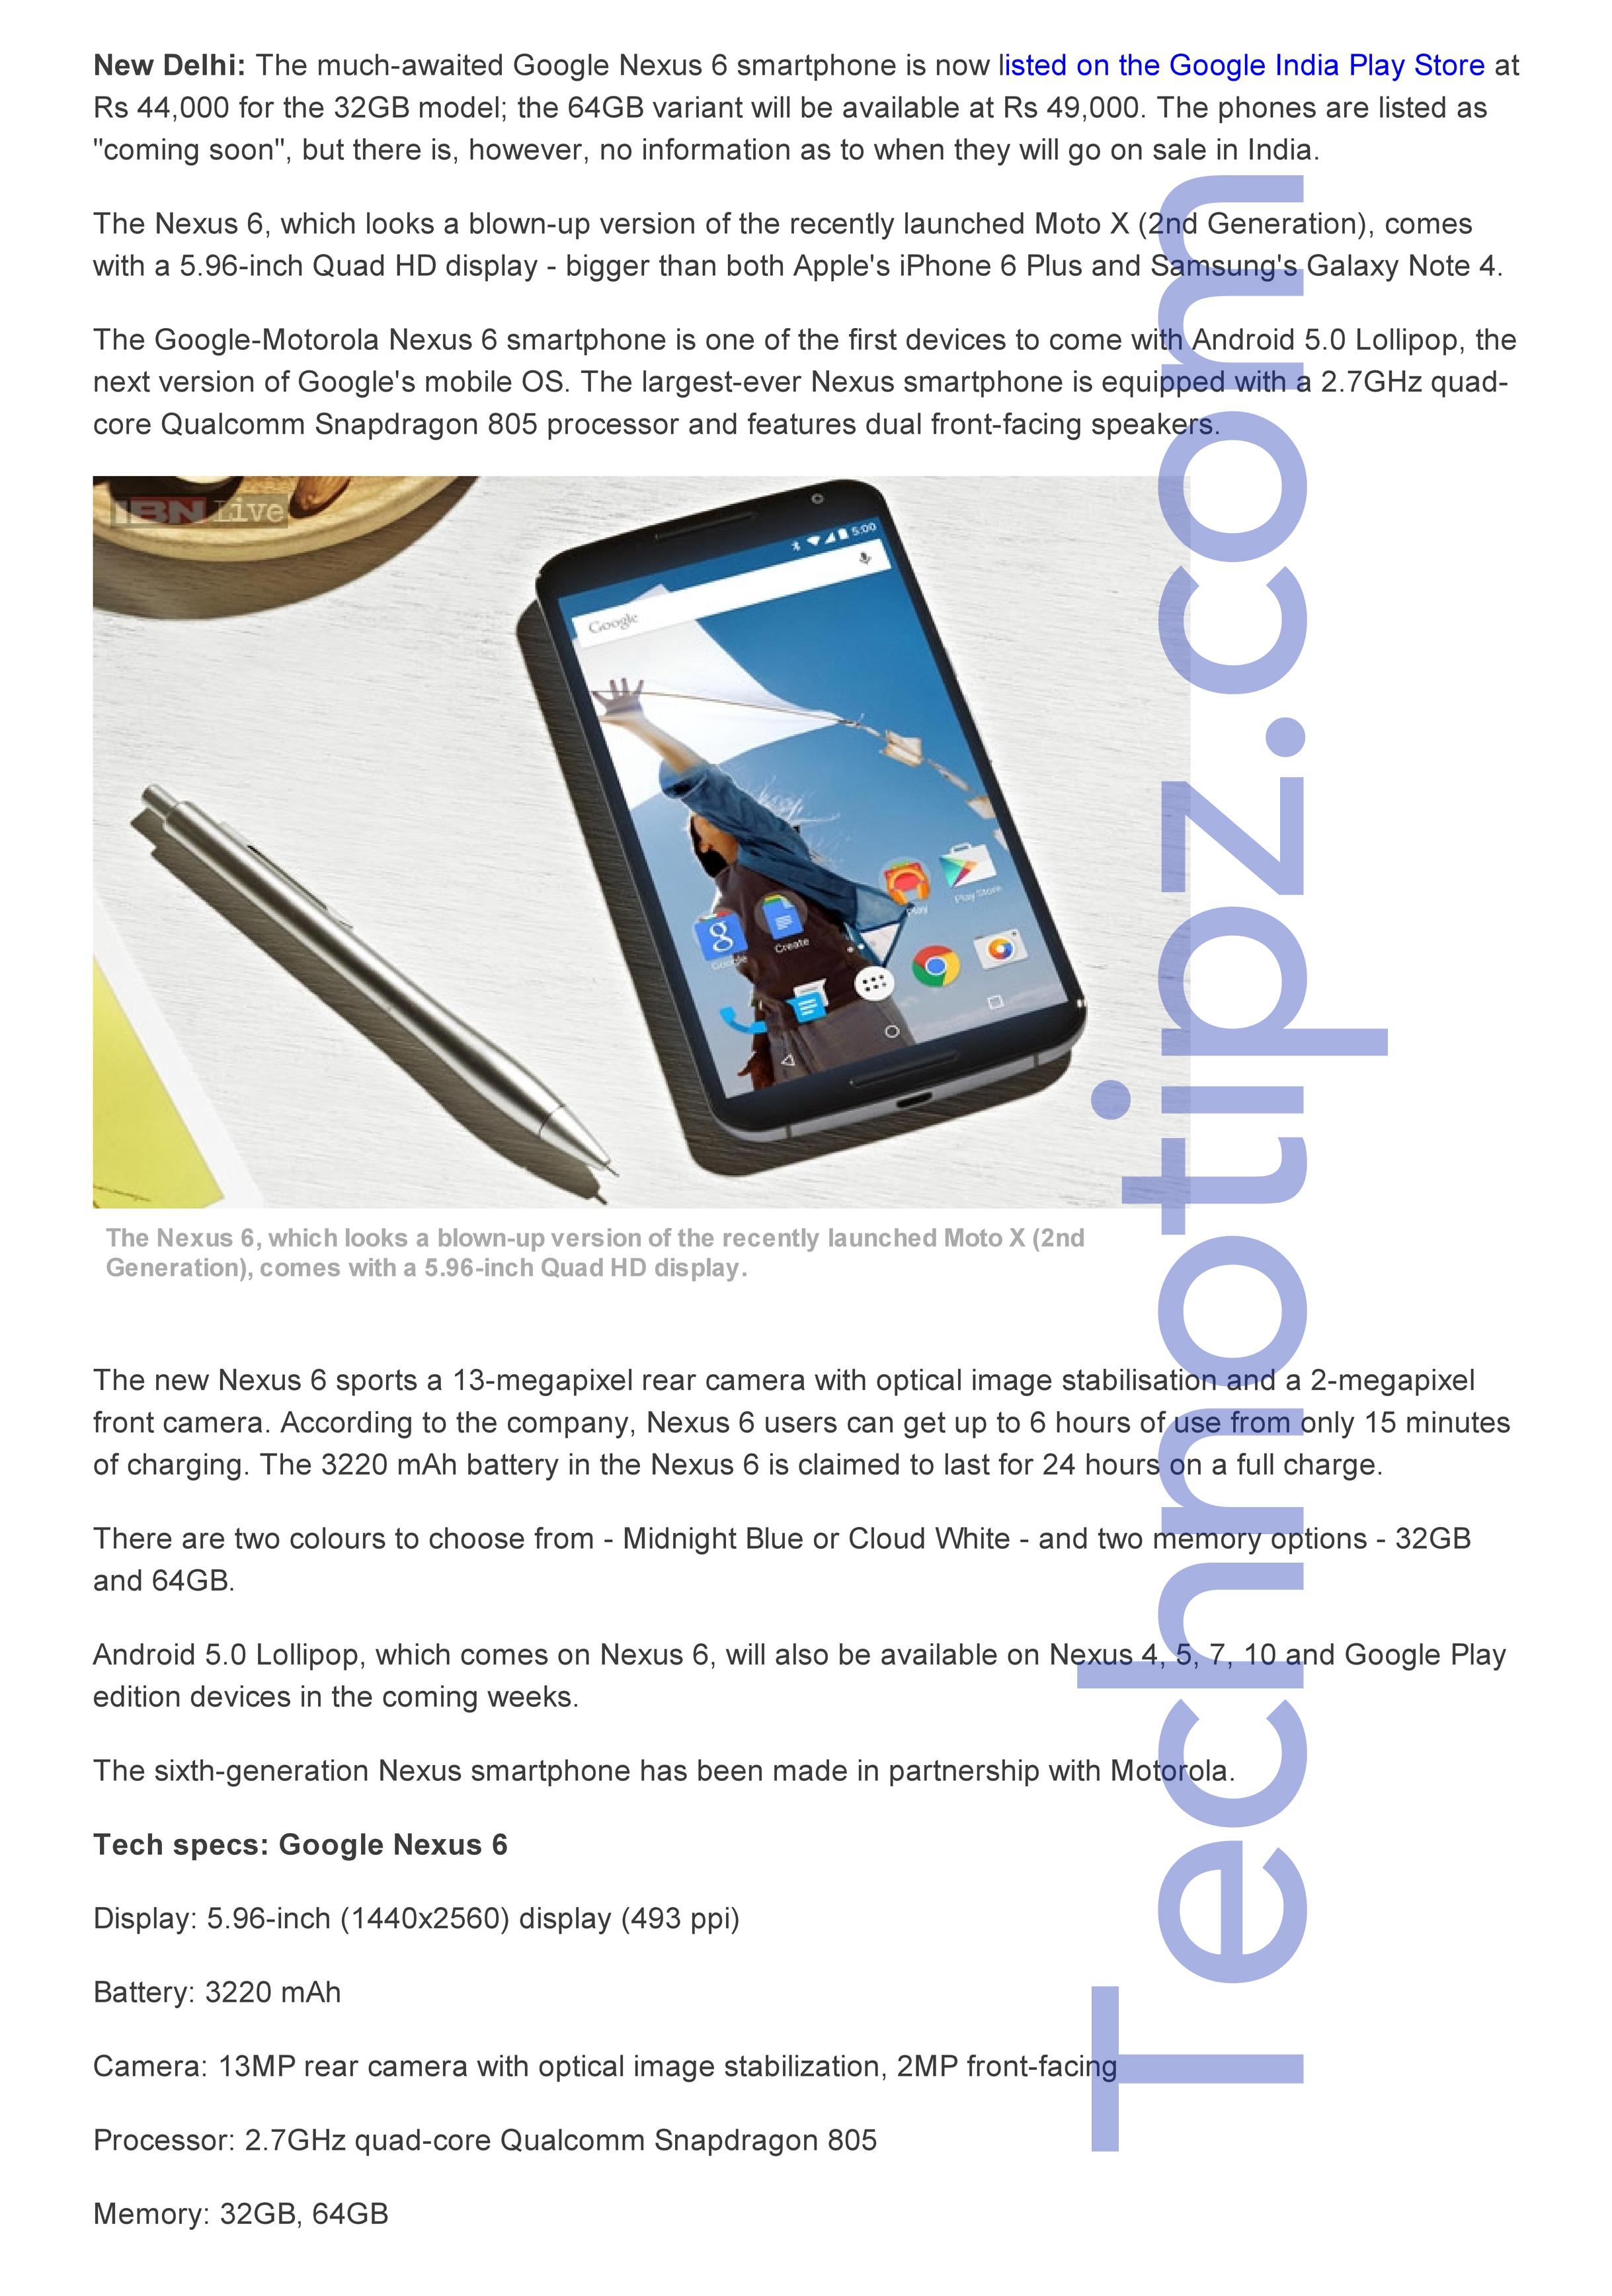 Google's Motorola Nexus 6 releasing in India at Rs 44,000 and Rs 49,000